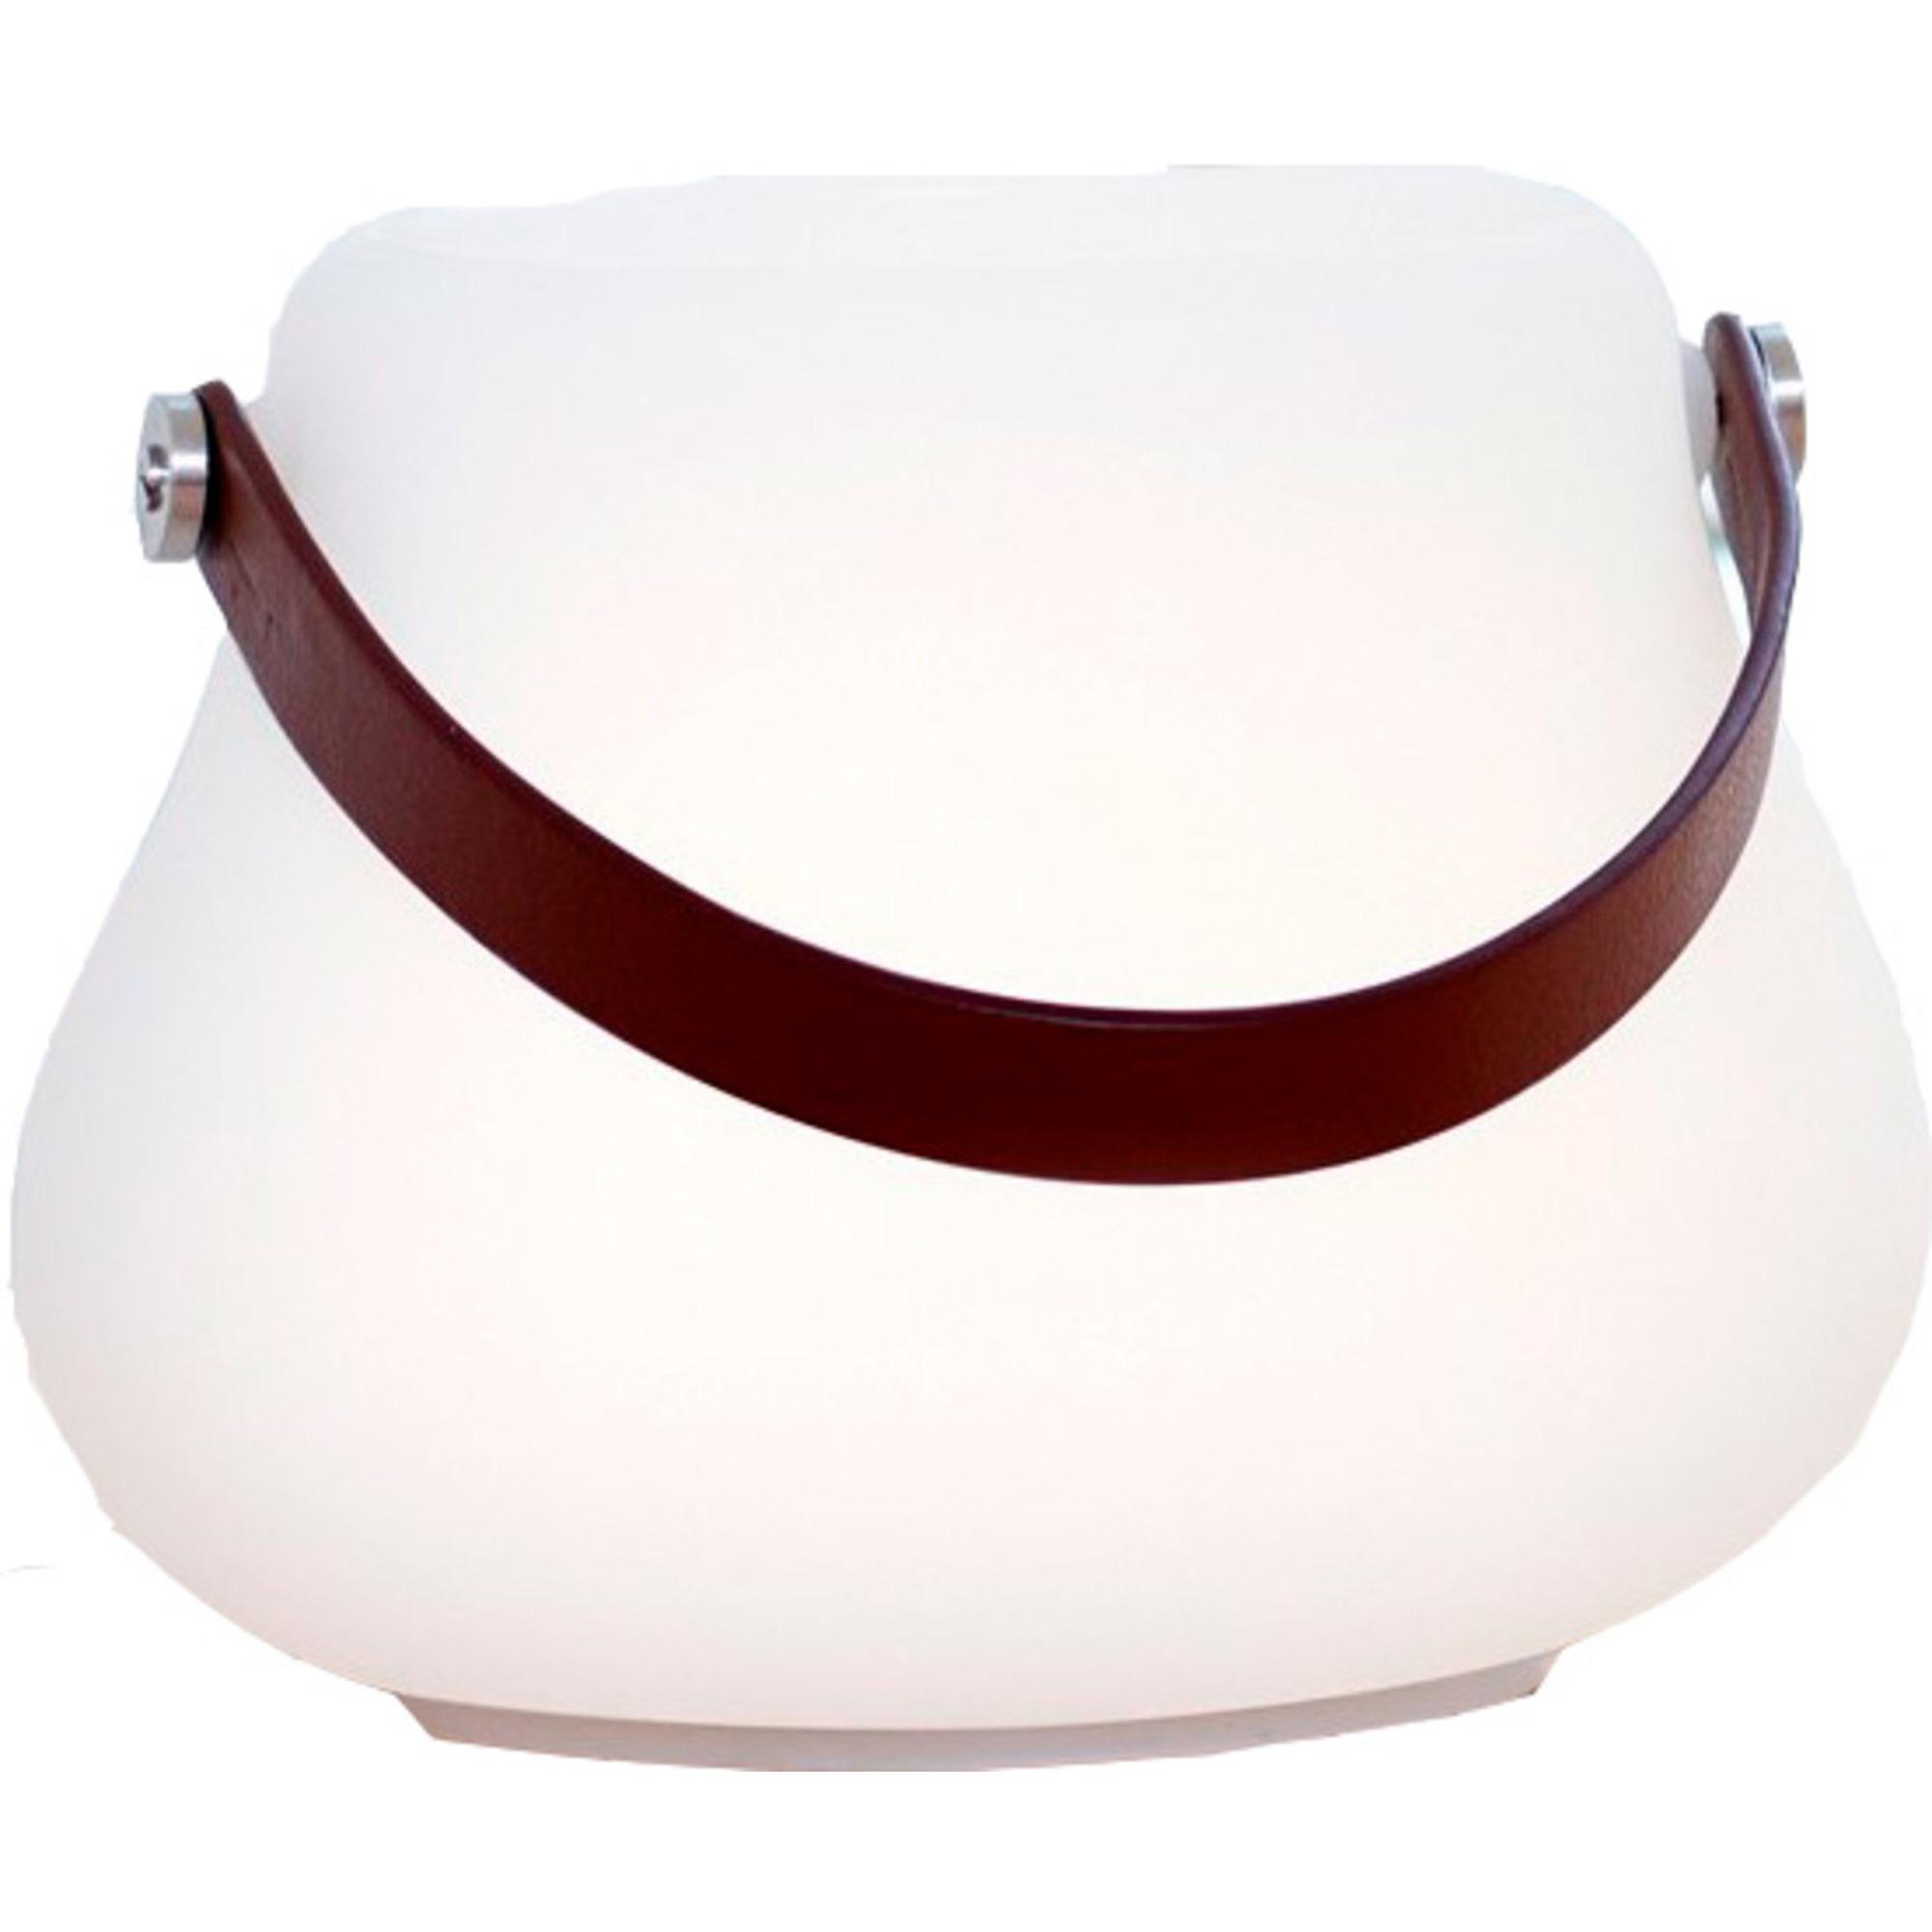 Nordic D'Luxx Flowerpot M Light & Speaker